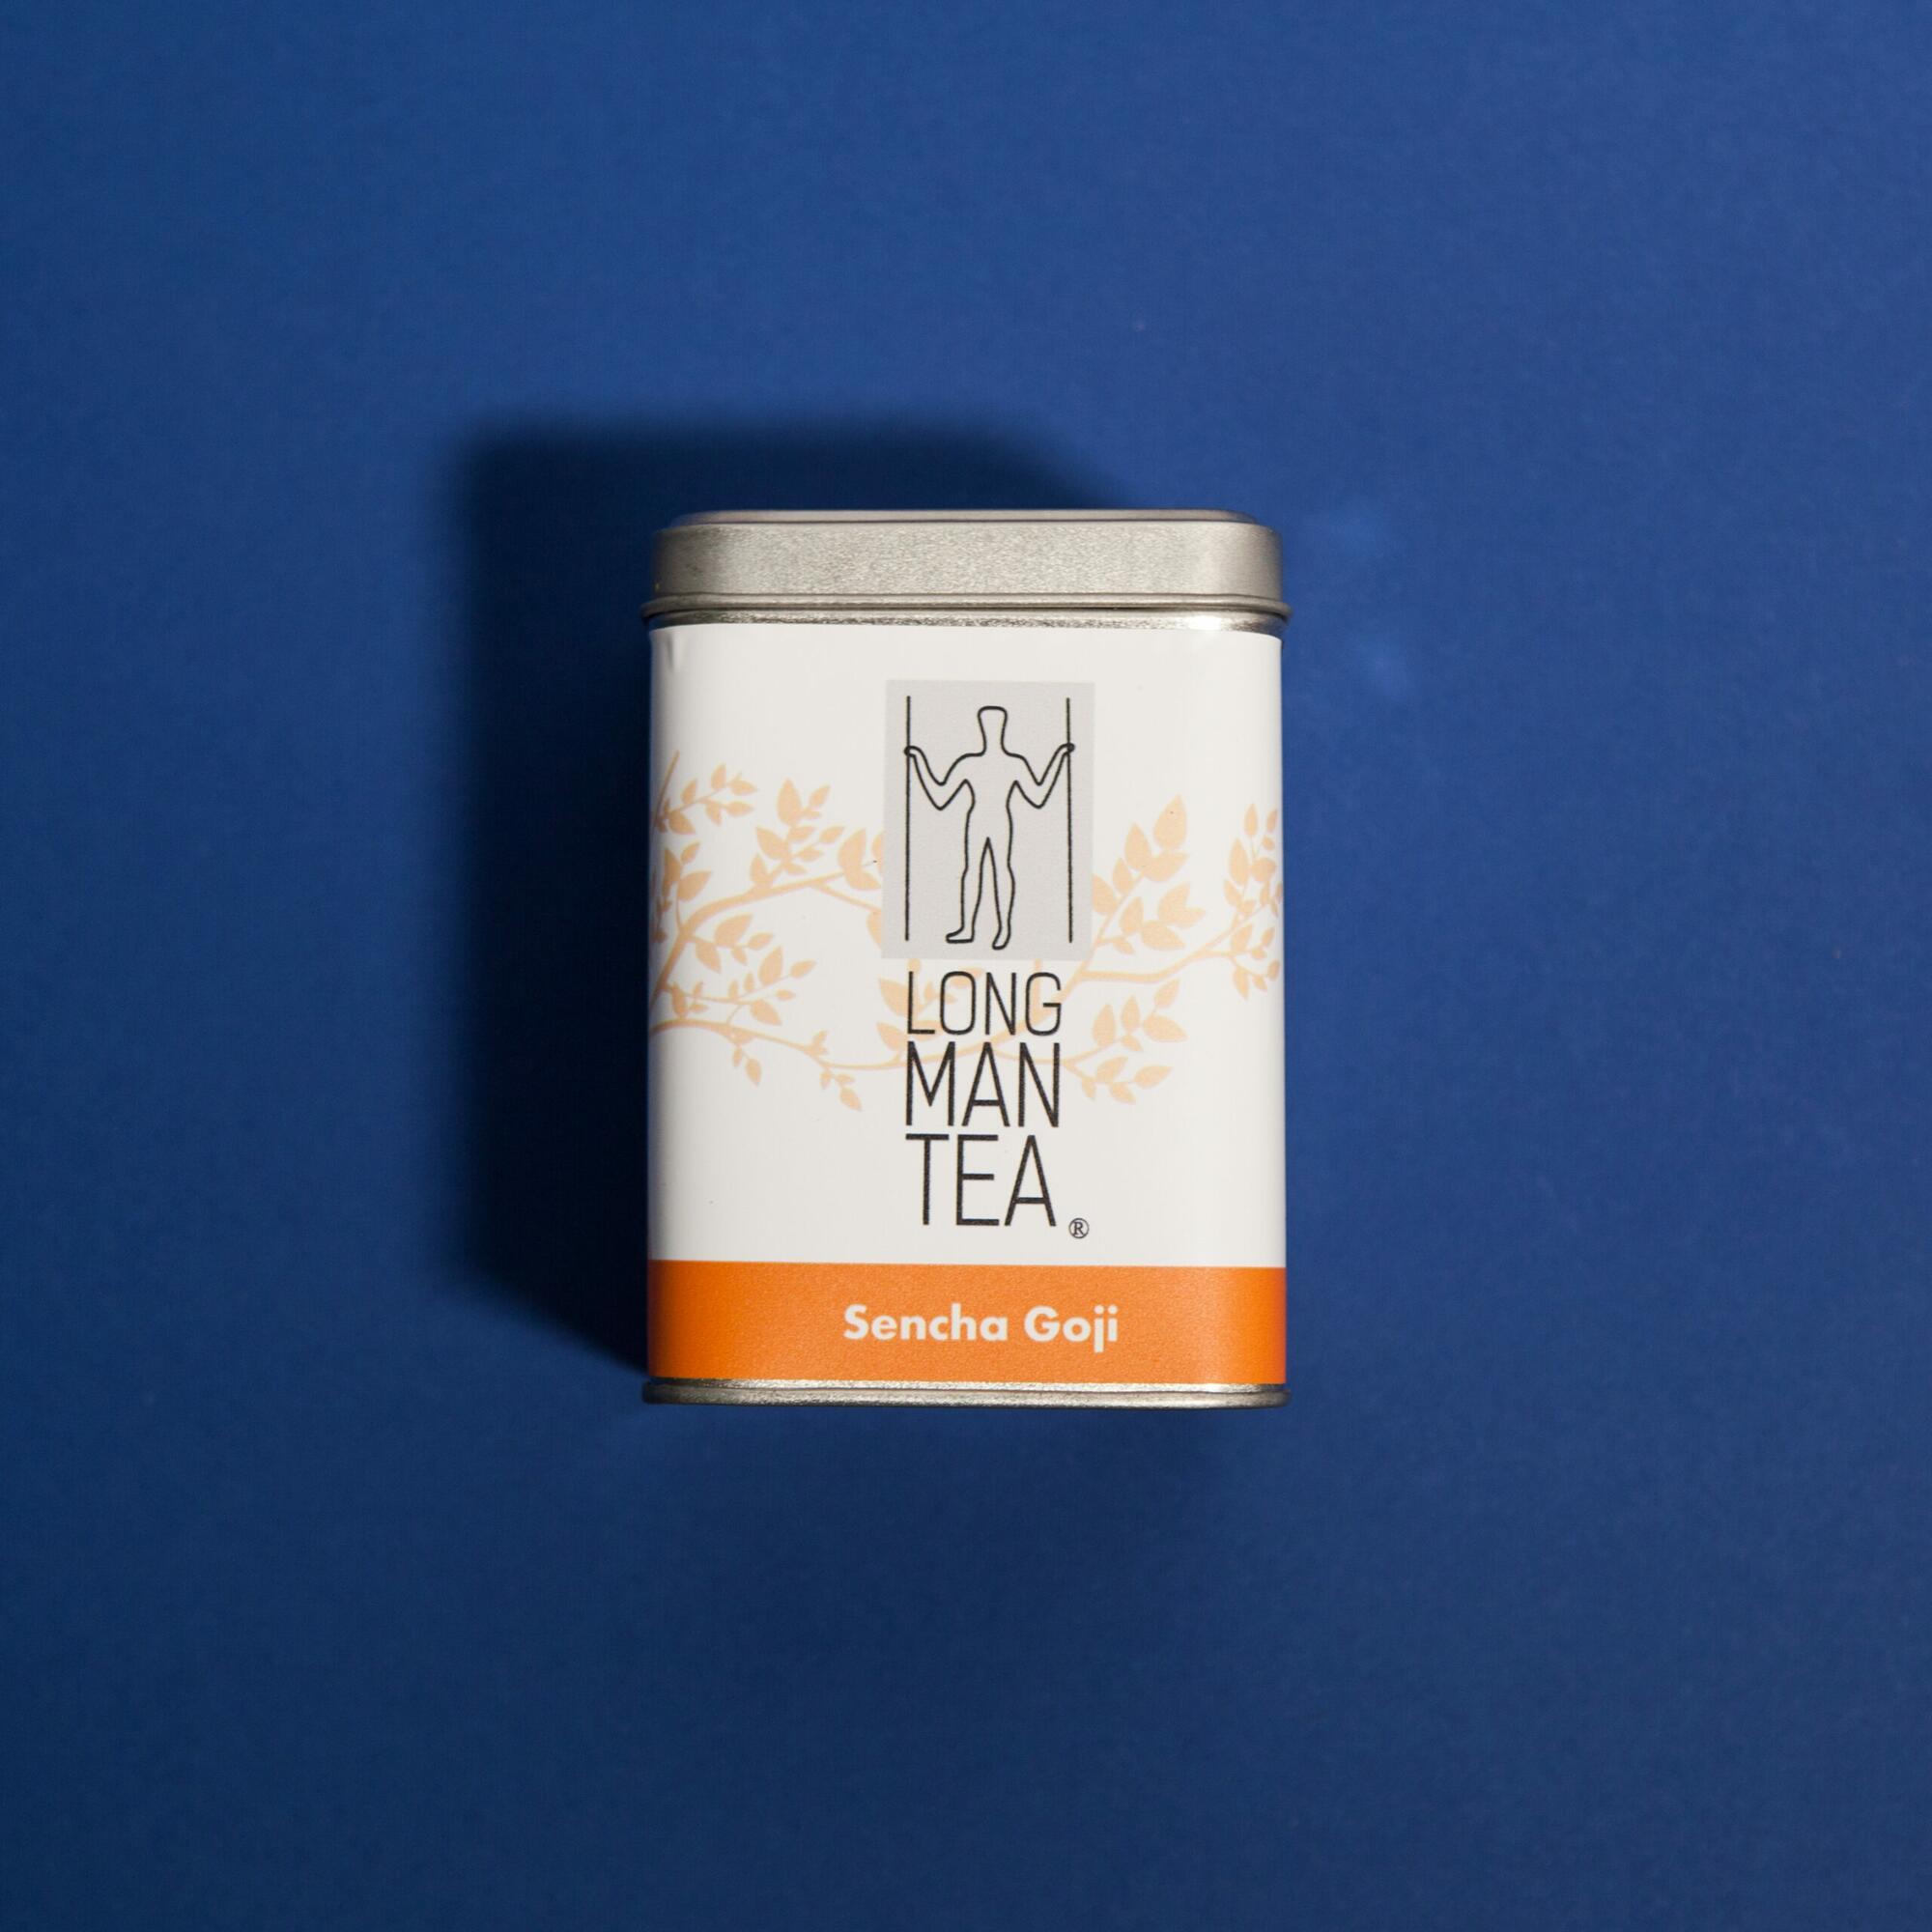 Long Men Tea- Sencha Goji 120g - Coffee Gang | JestemSlow.pl